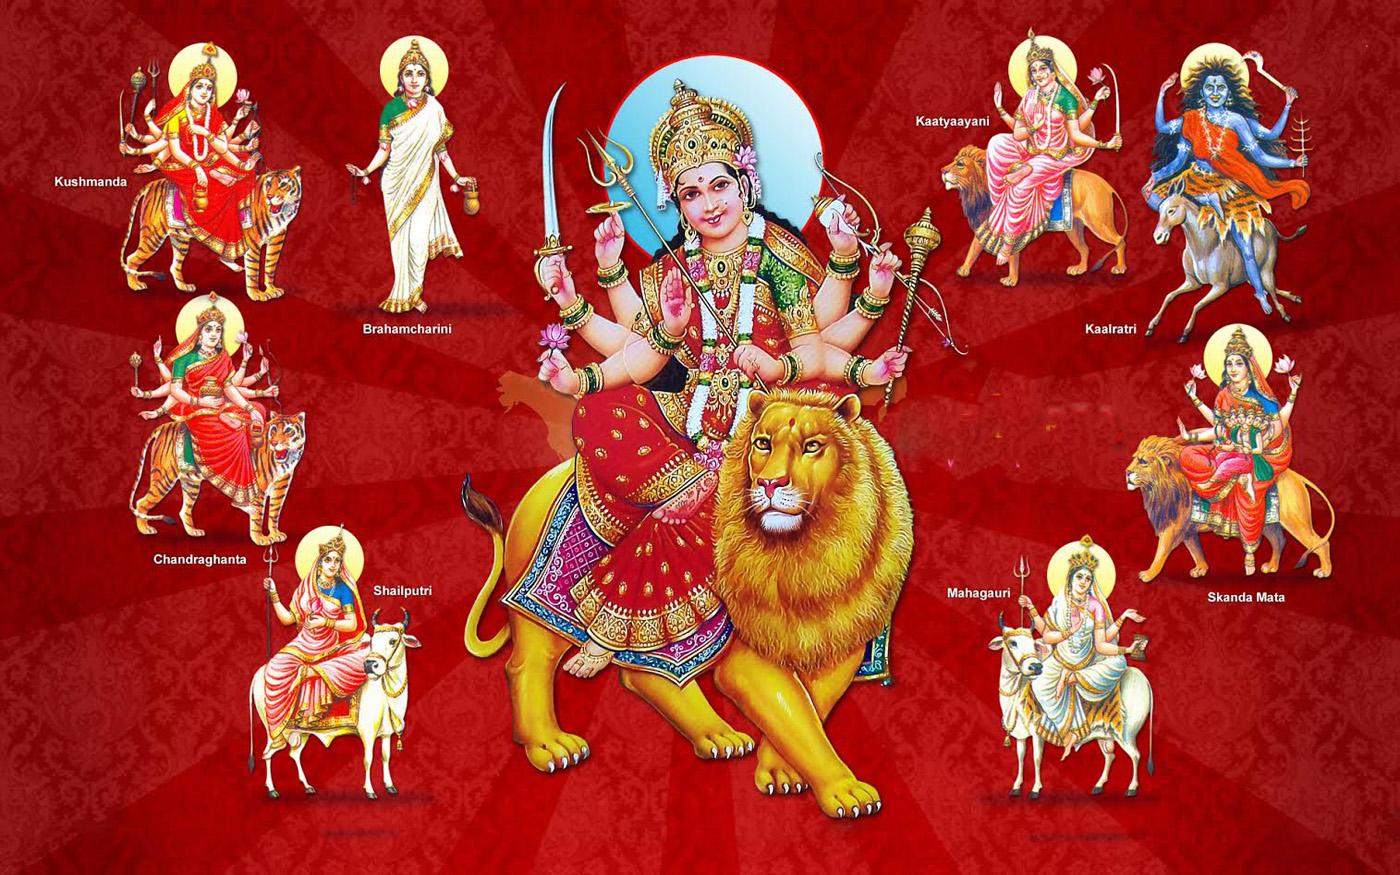 Gujarat garba gripped as Navratri 2018 enters into last phase